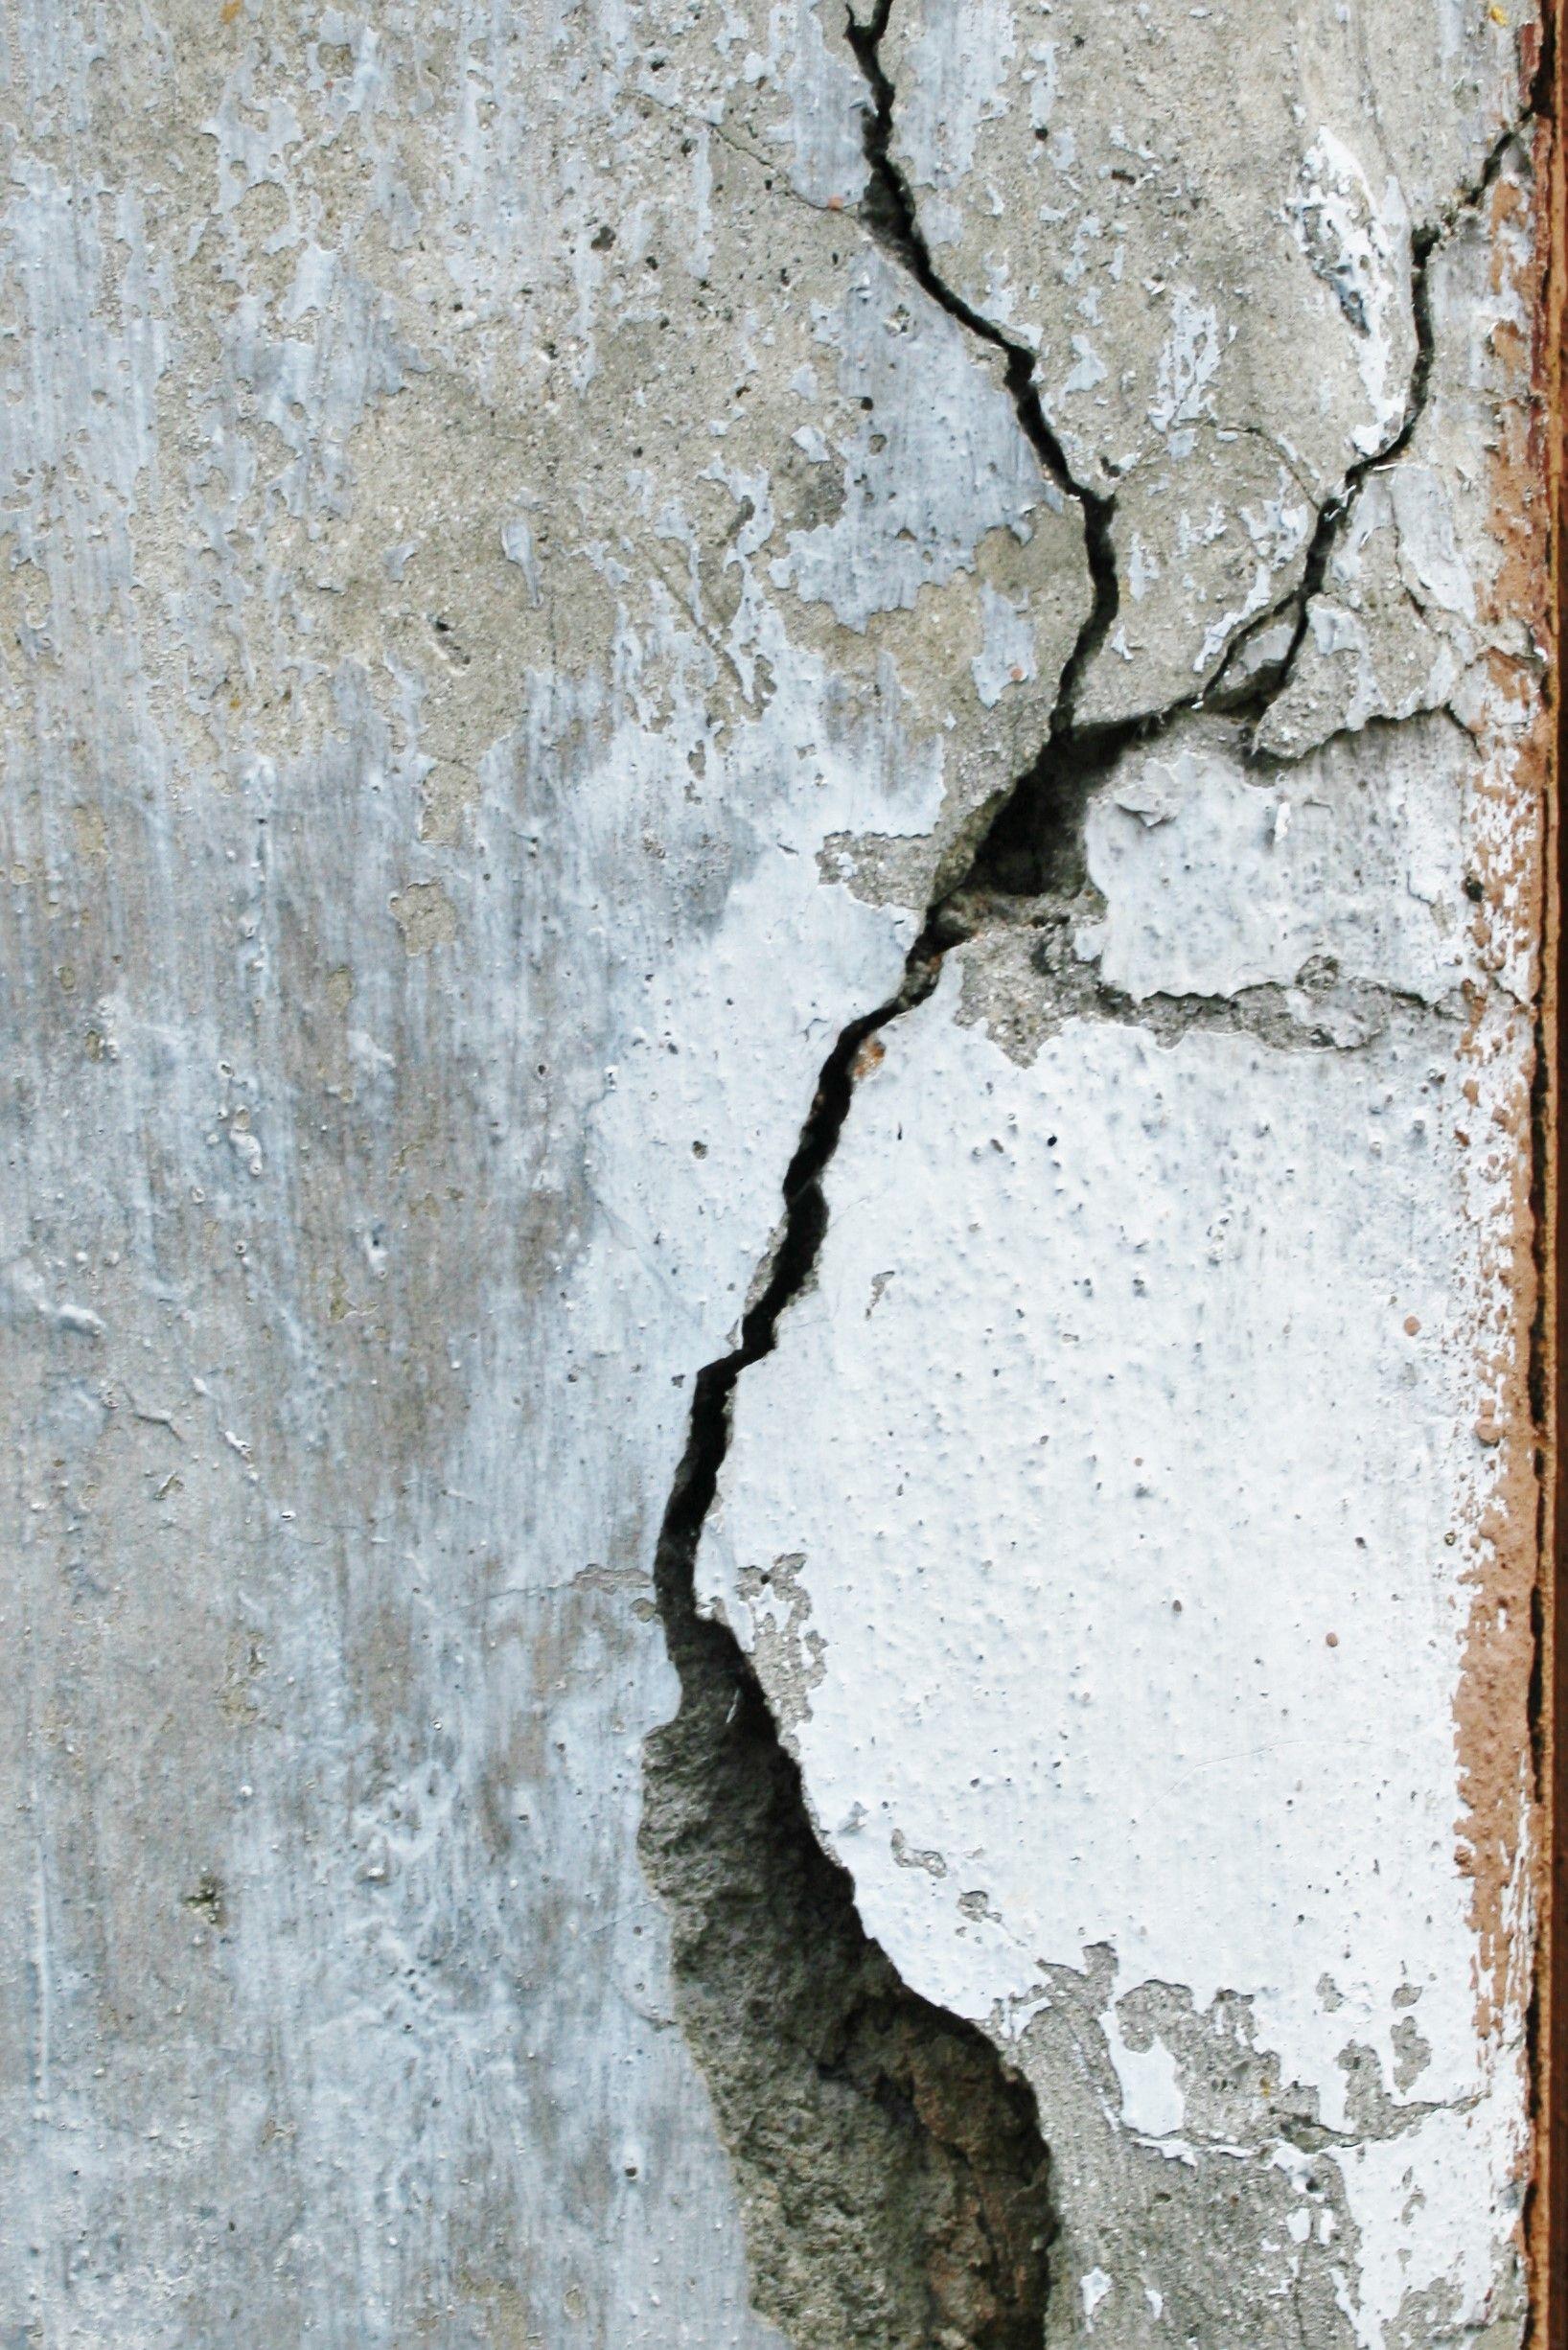 Cracked wall in kathmandu nepal cracked wall texture